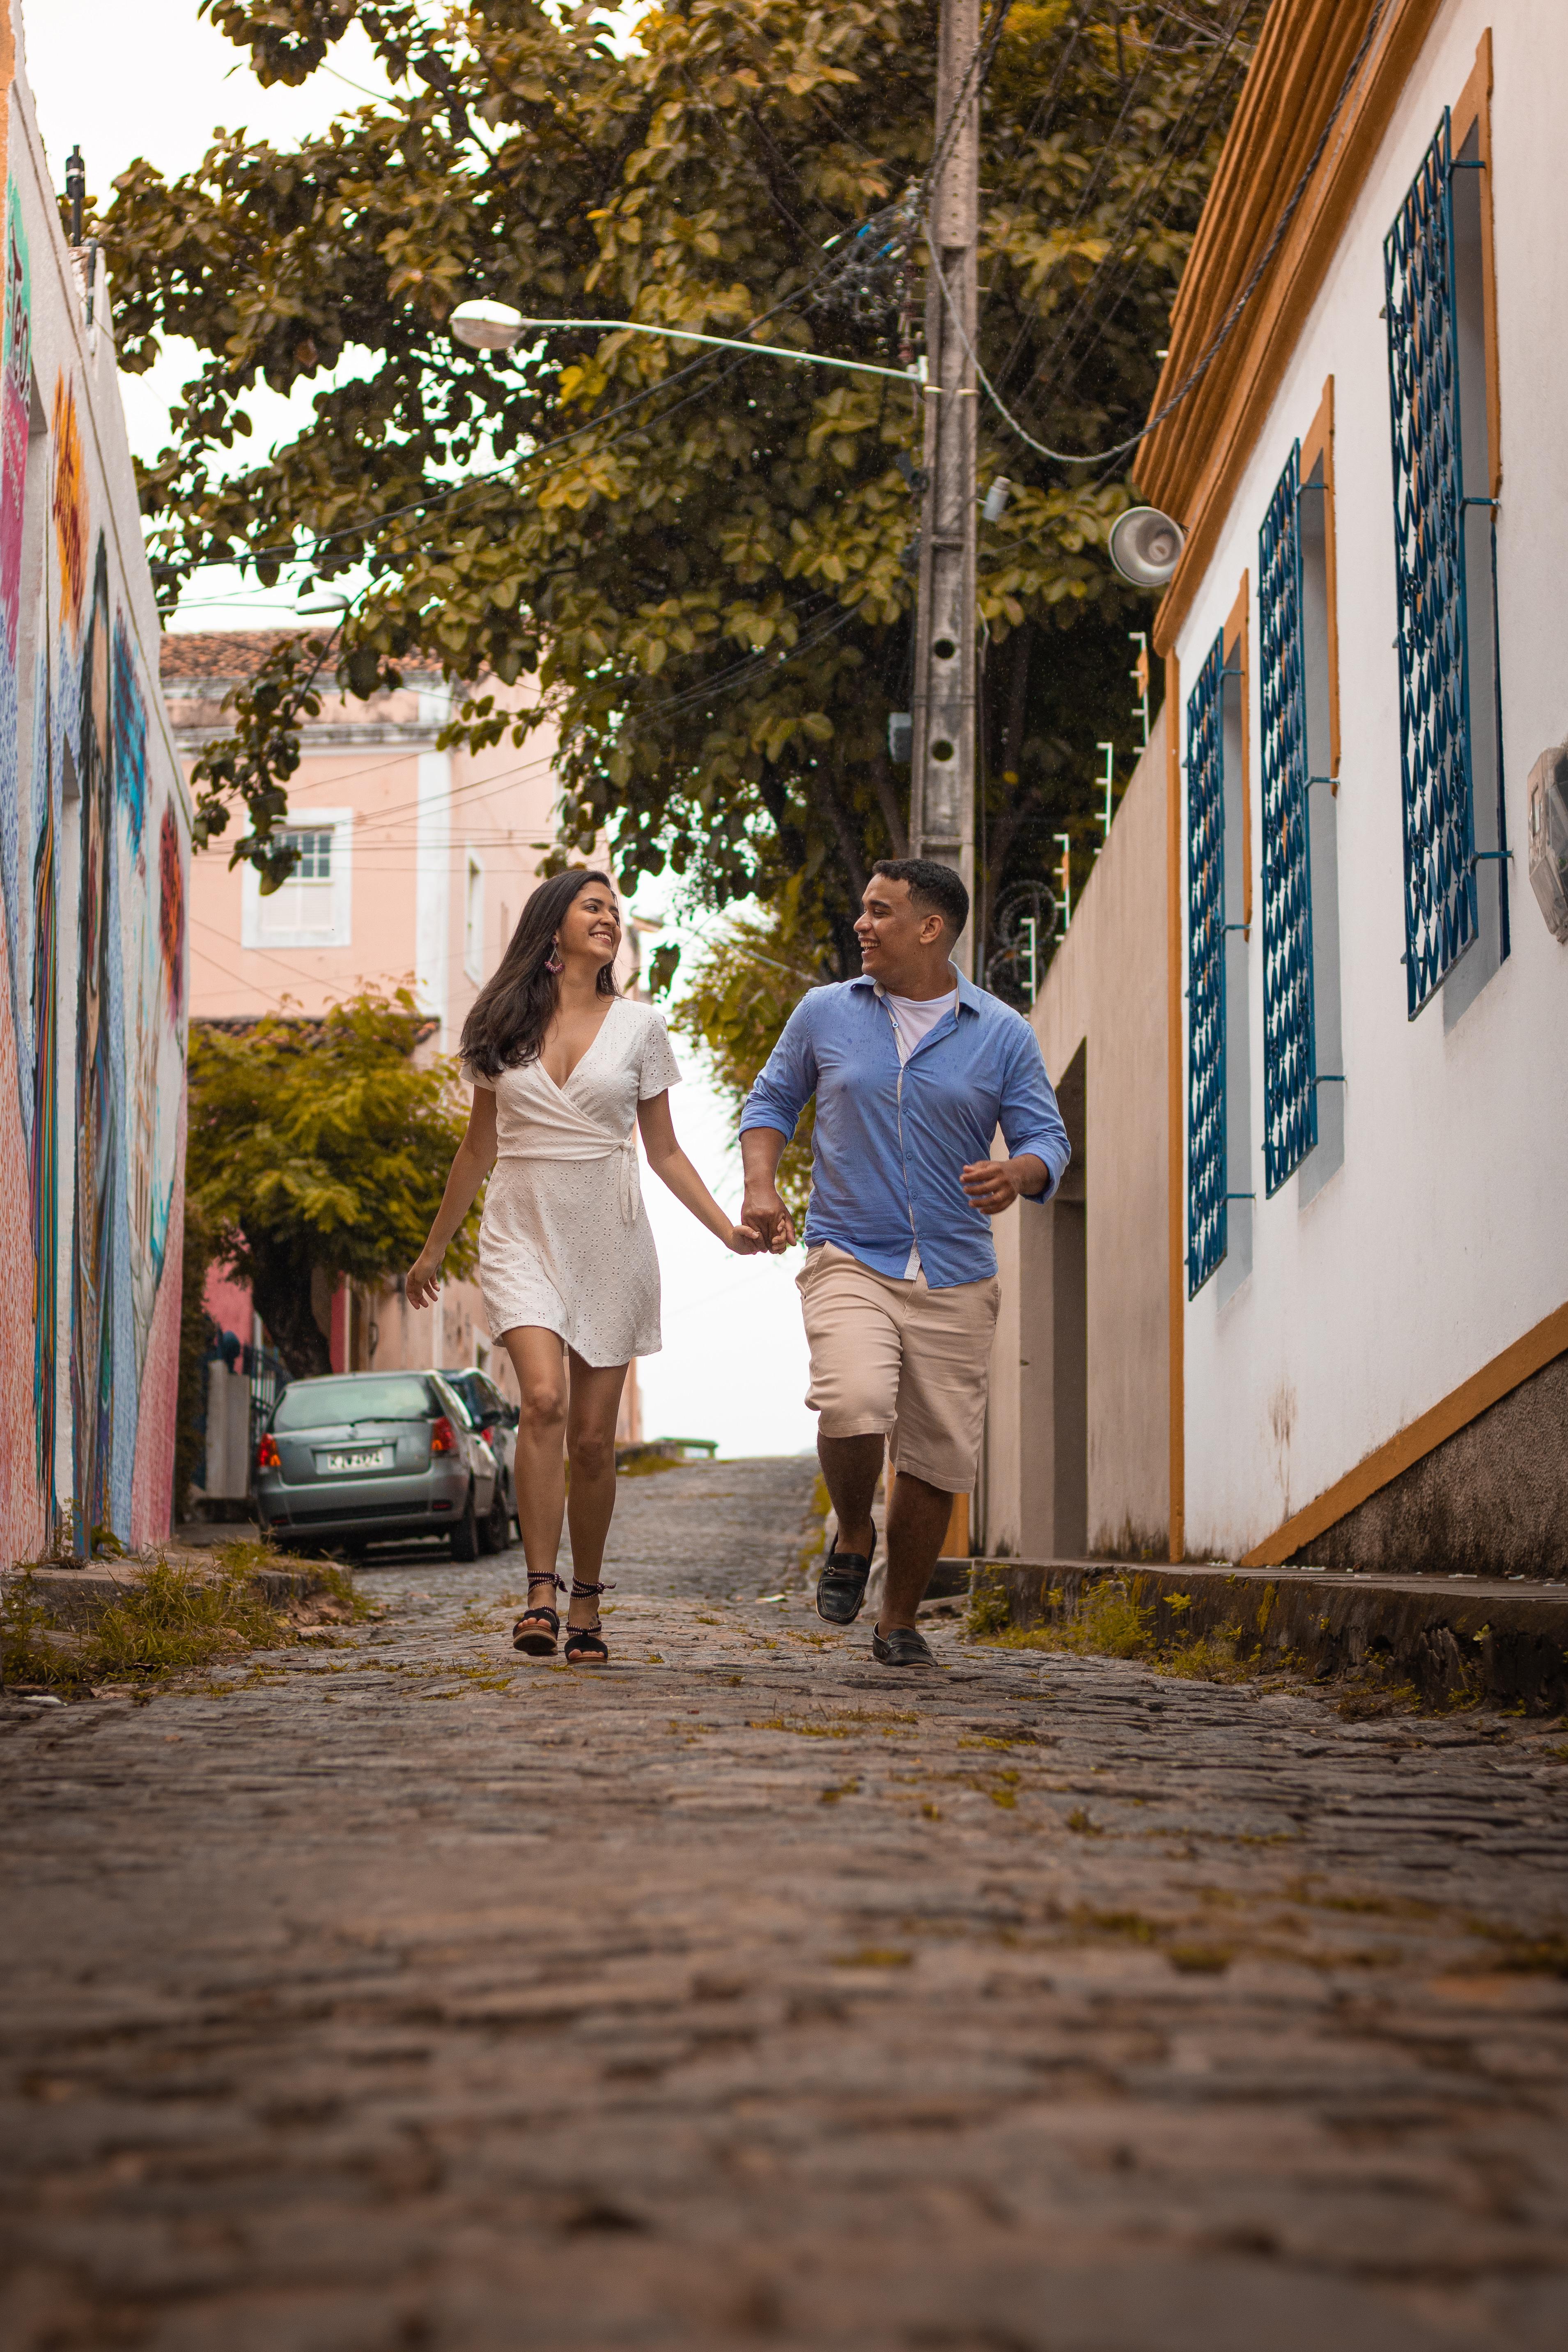 Woman Wearing White Dress Walking Beside of Man Wearing Blue Dress Shirt